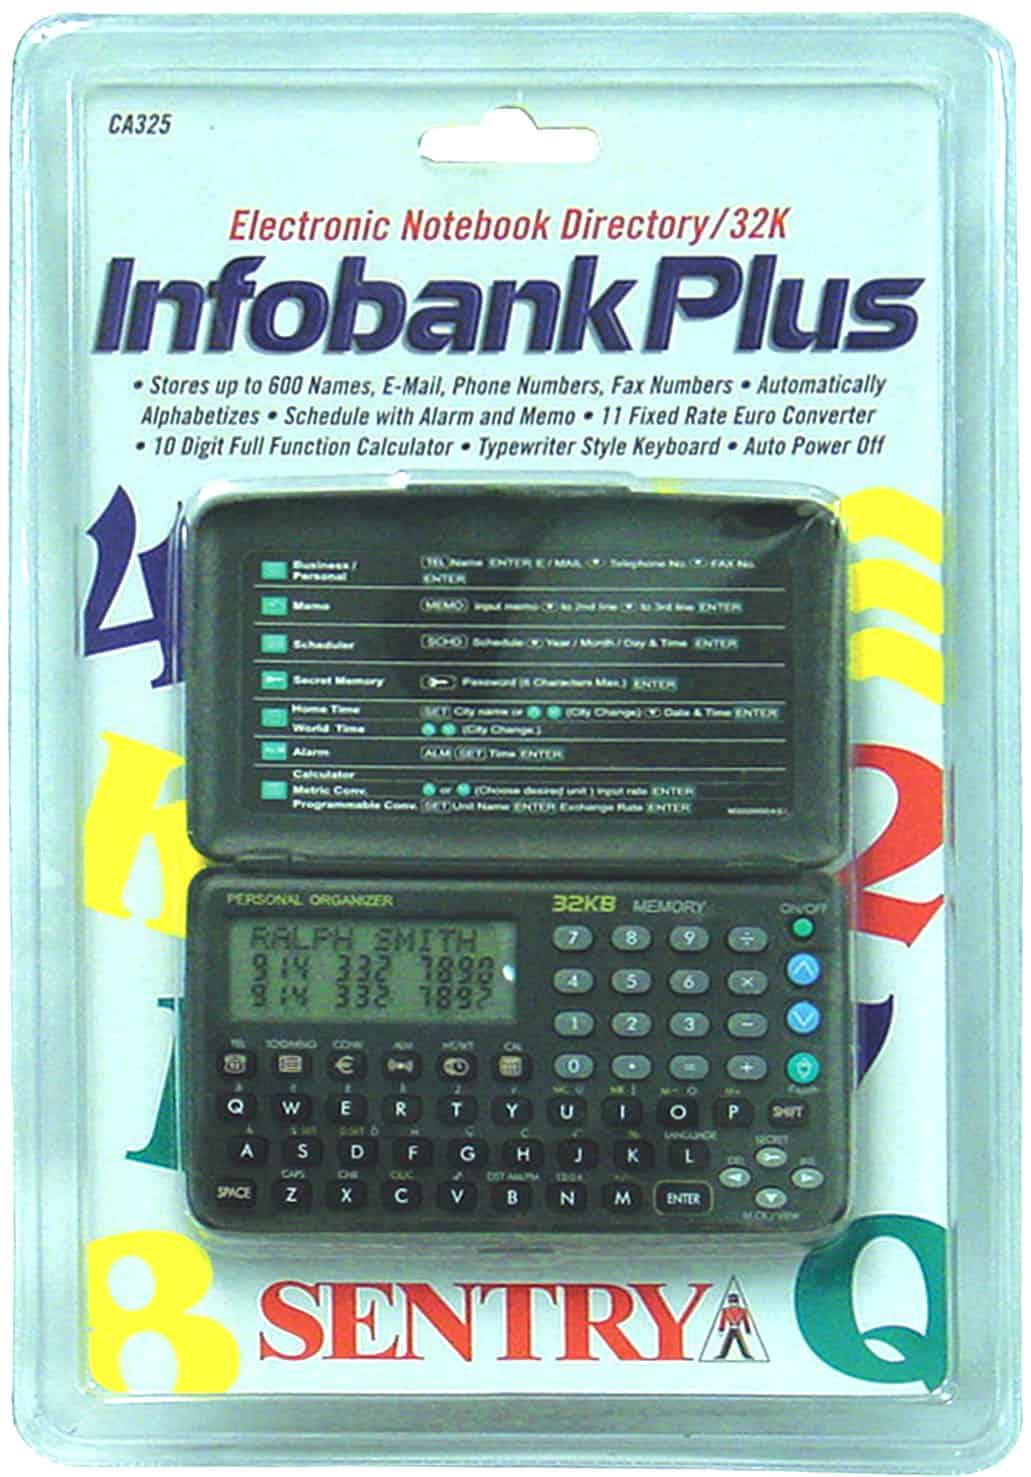 117325 - Sentry - Infobank Plus 32K Electronic Notebook